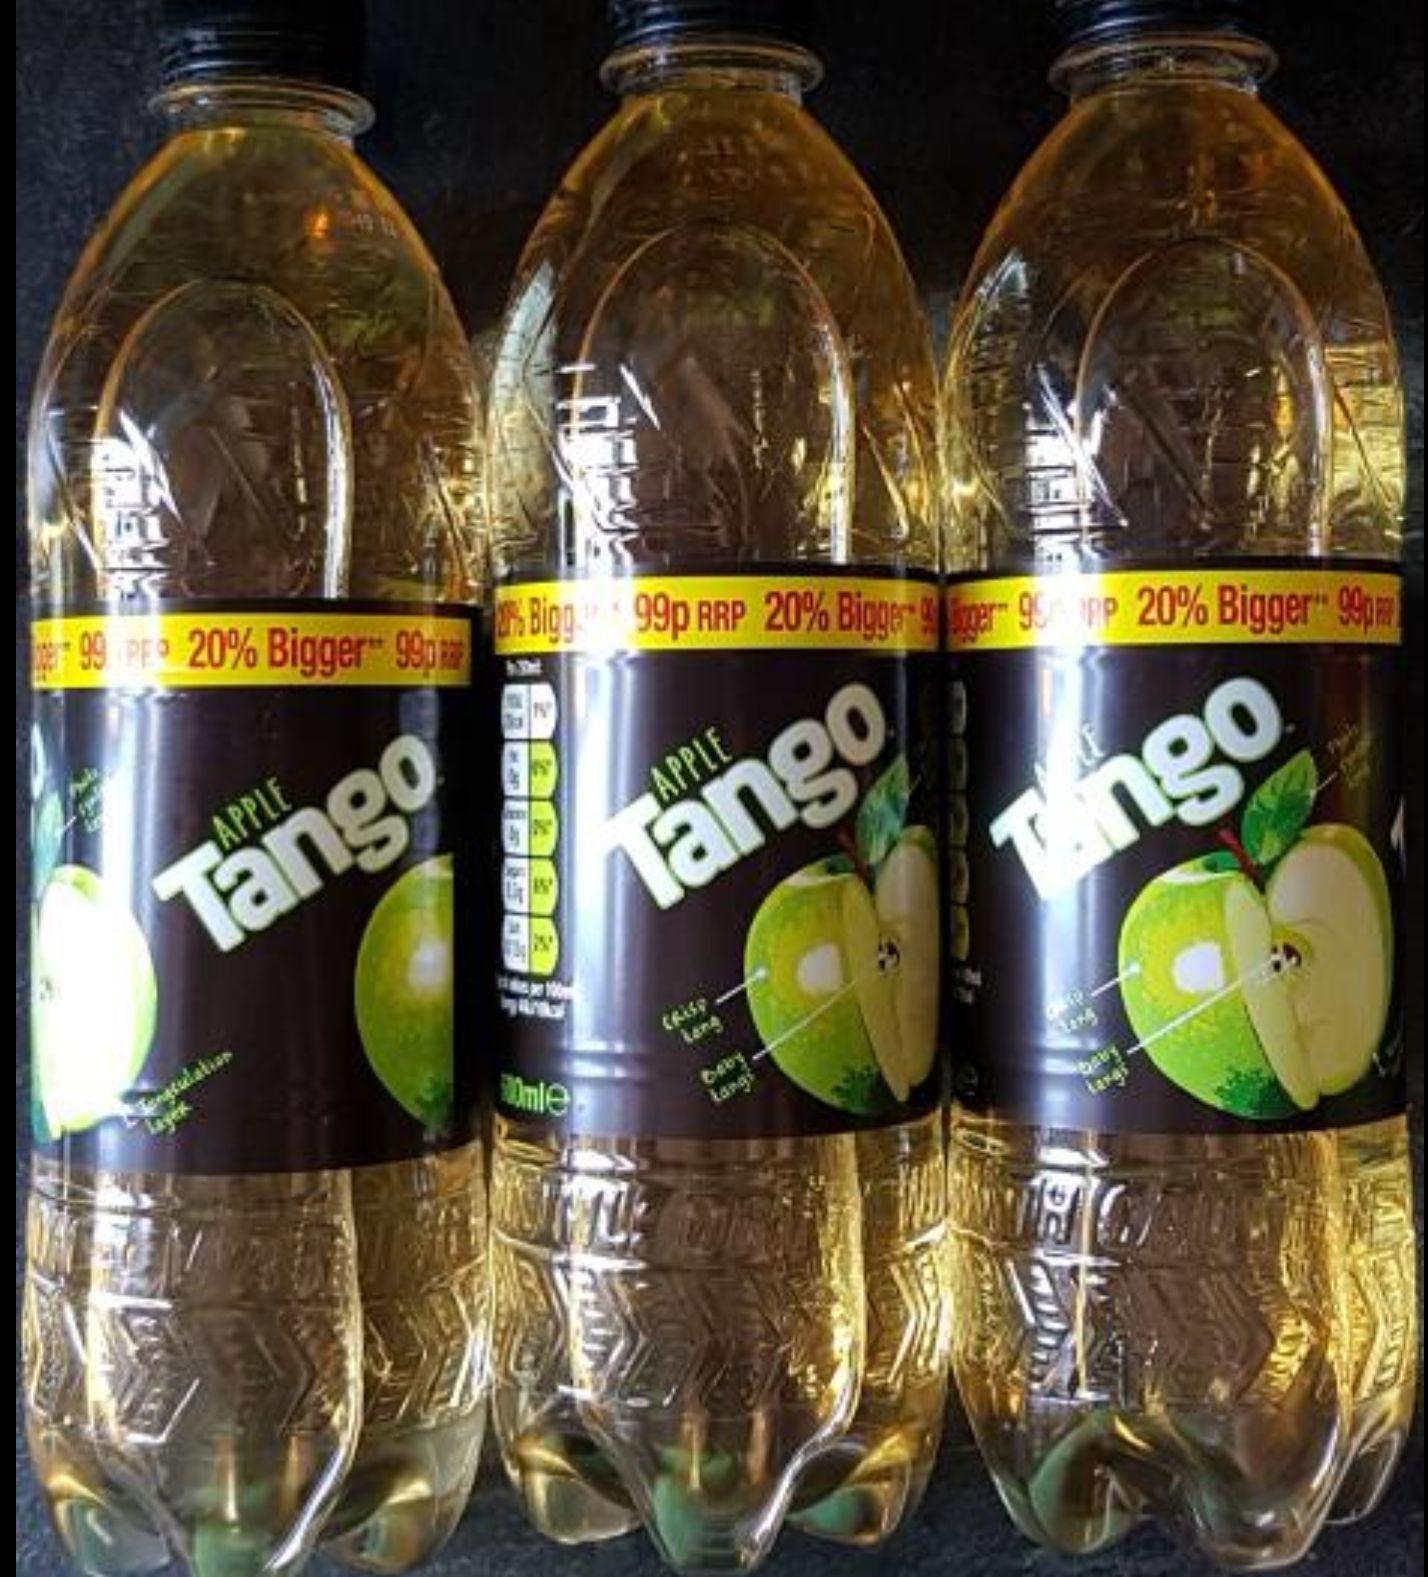 Tango apple 600ml 3 for £1 @ heron foods